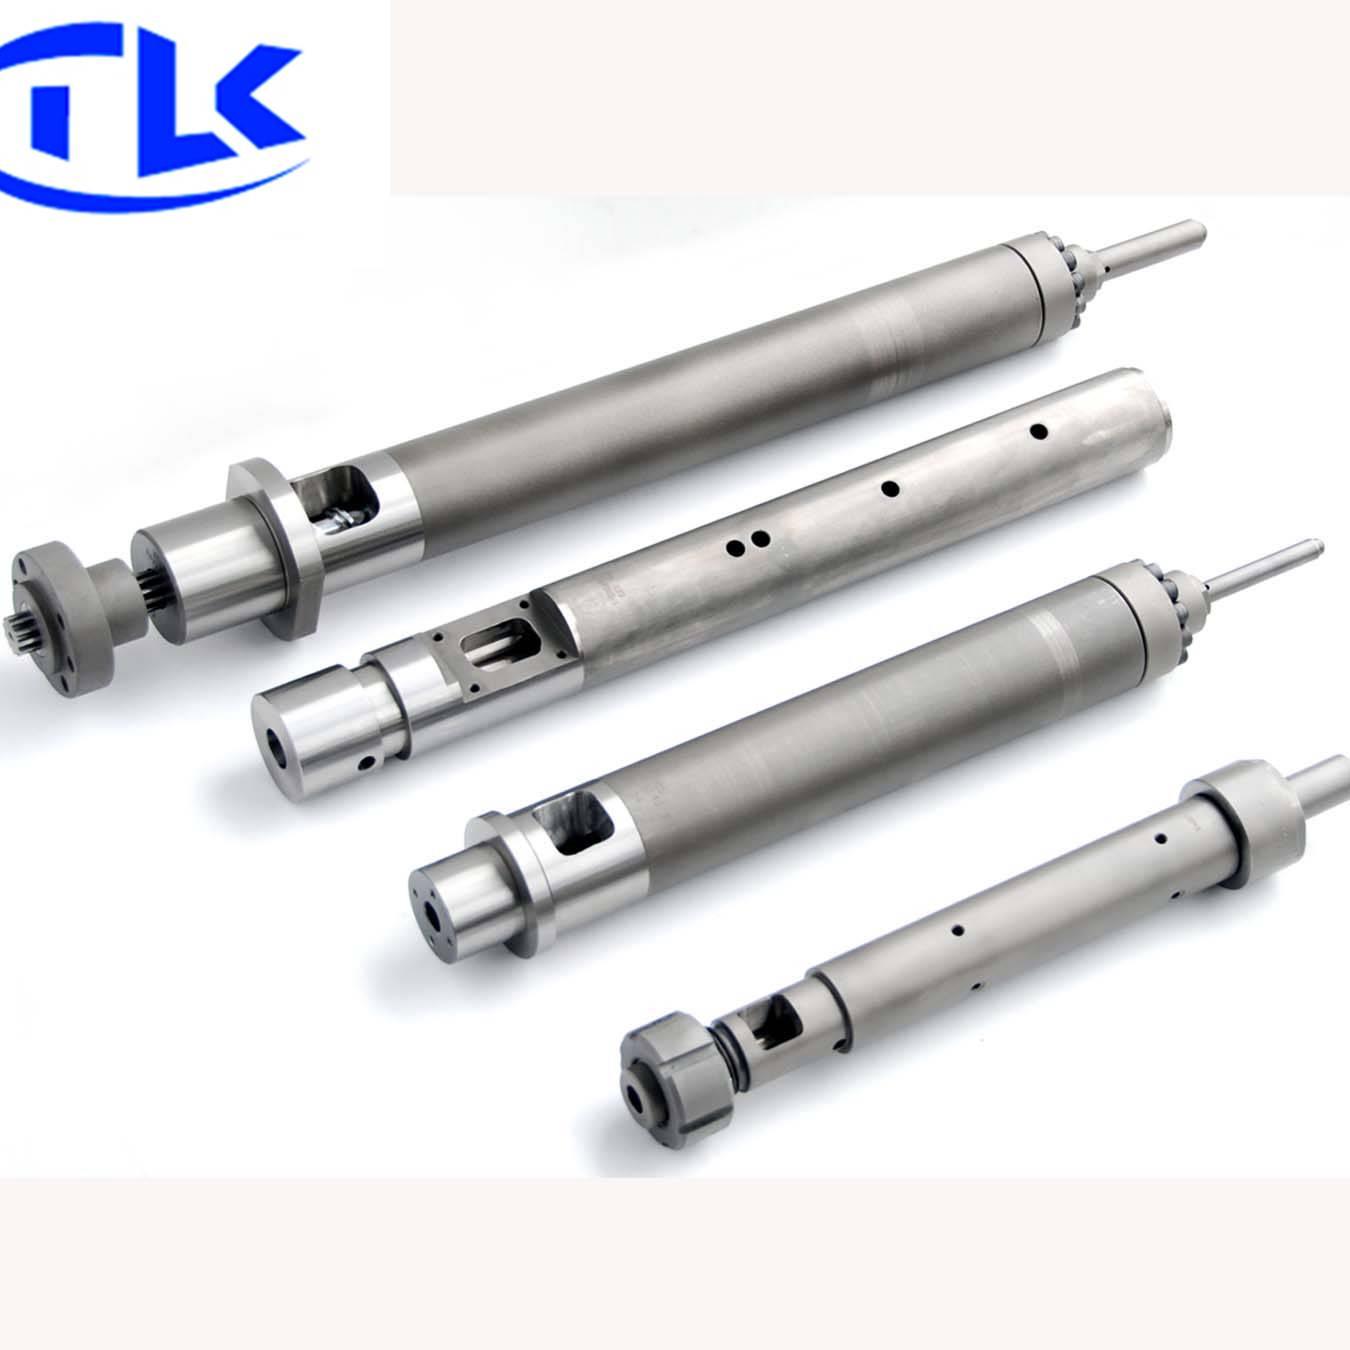 ChenHsong Jetmaster JM228 Injection Machine Screw Barrel